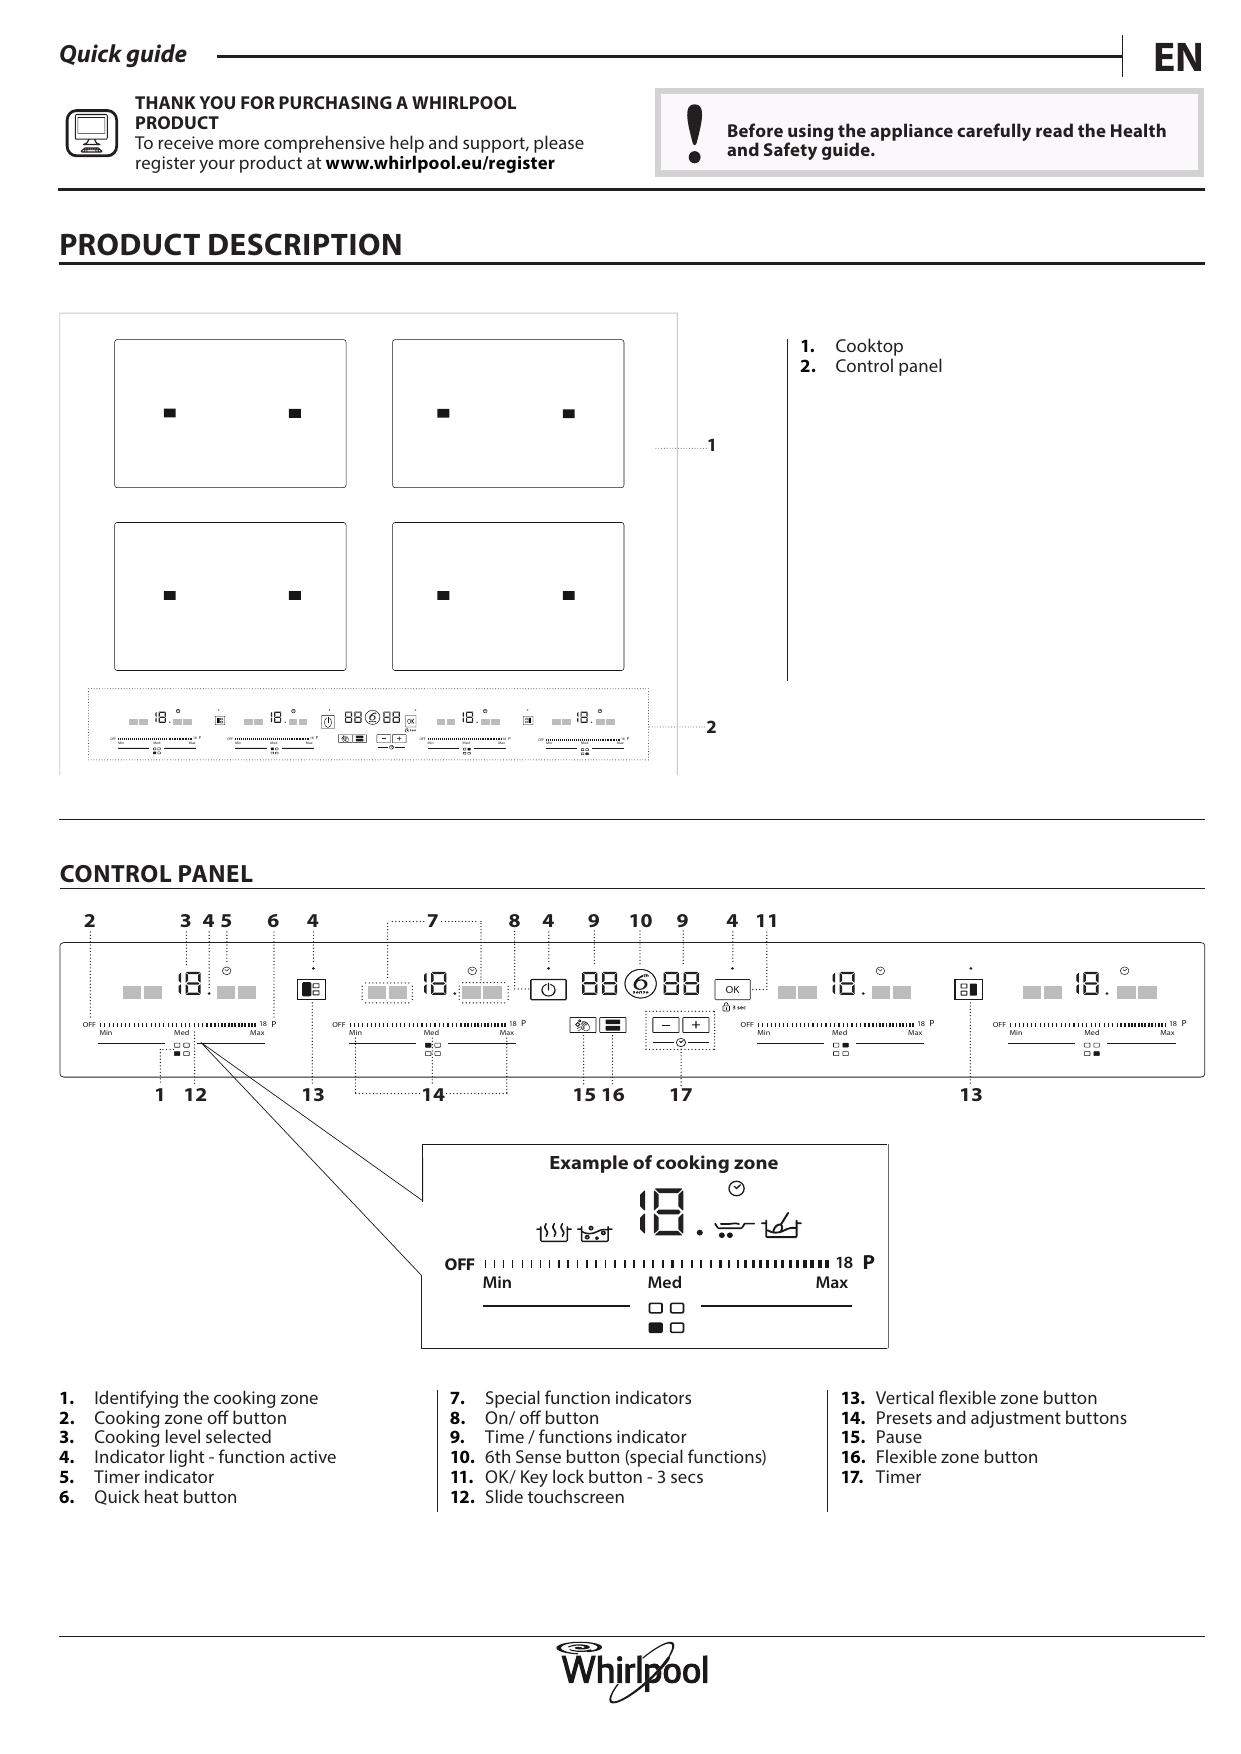 Whirlpool Smo 658c Ne User Guide Manualzz